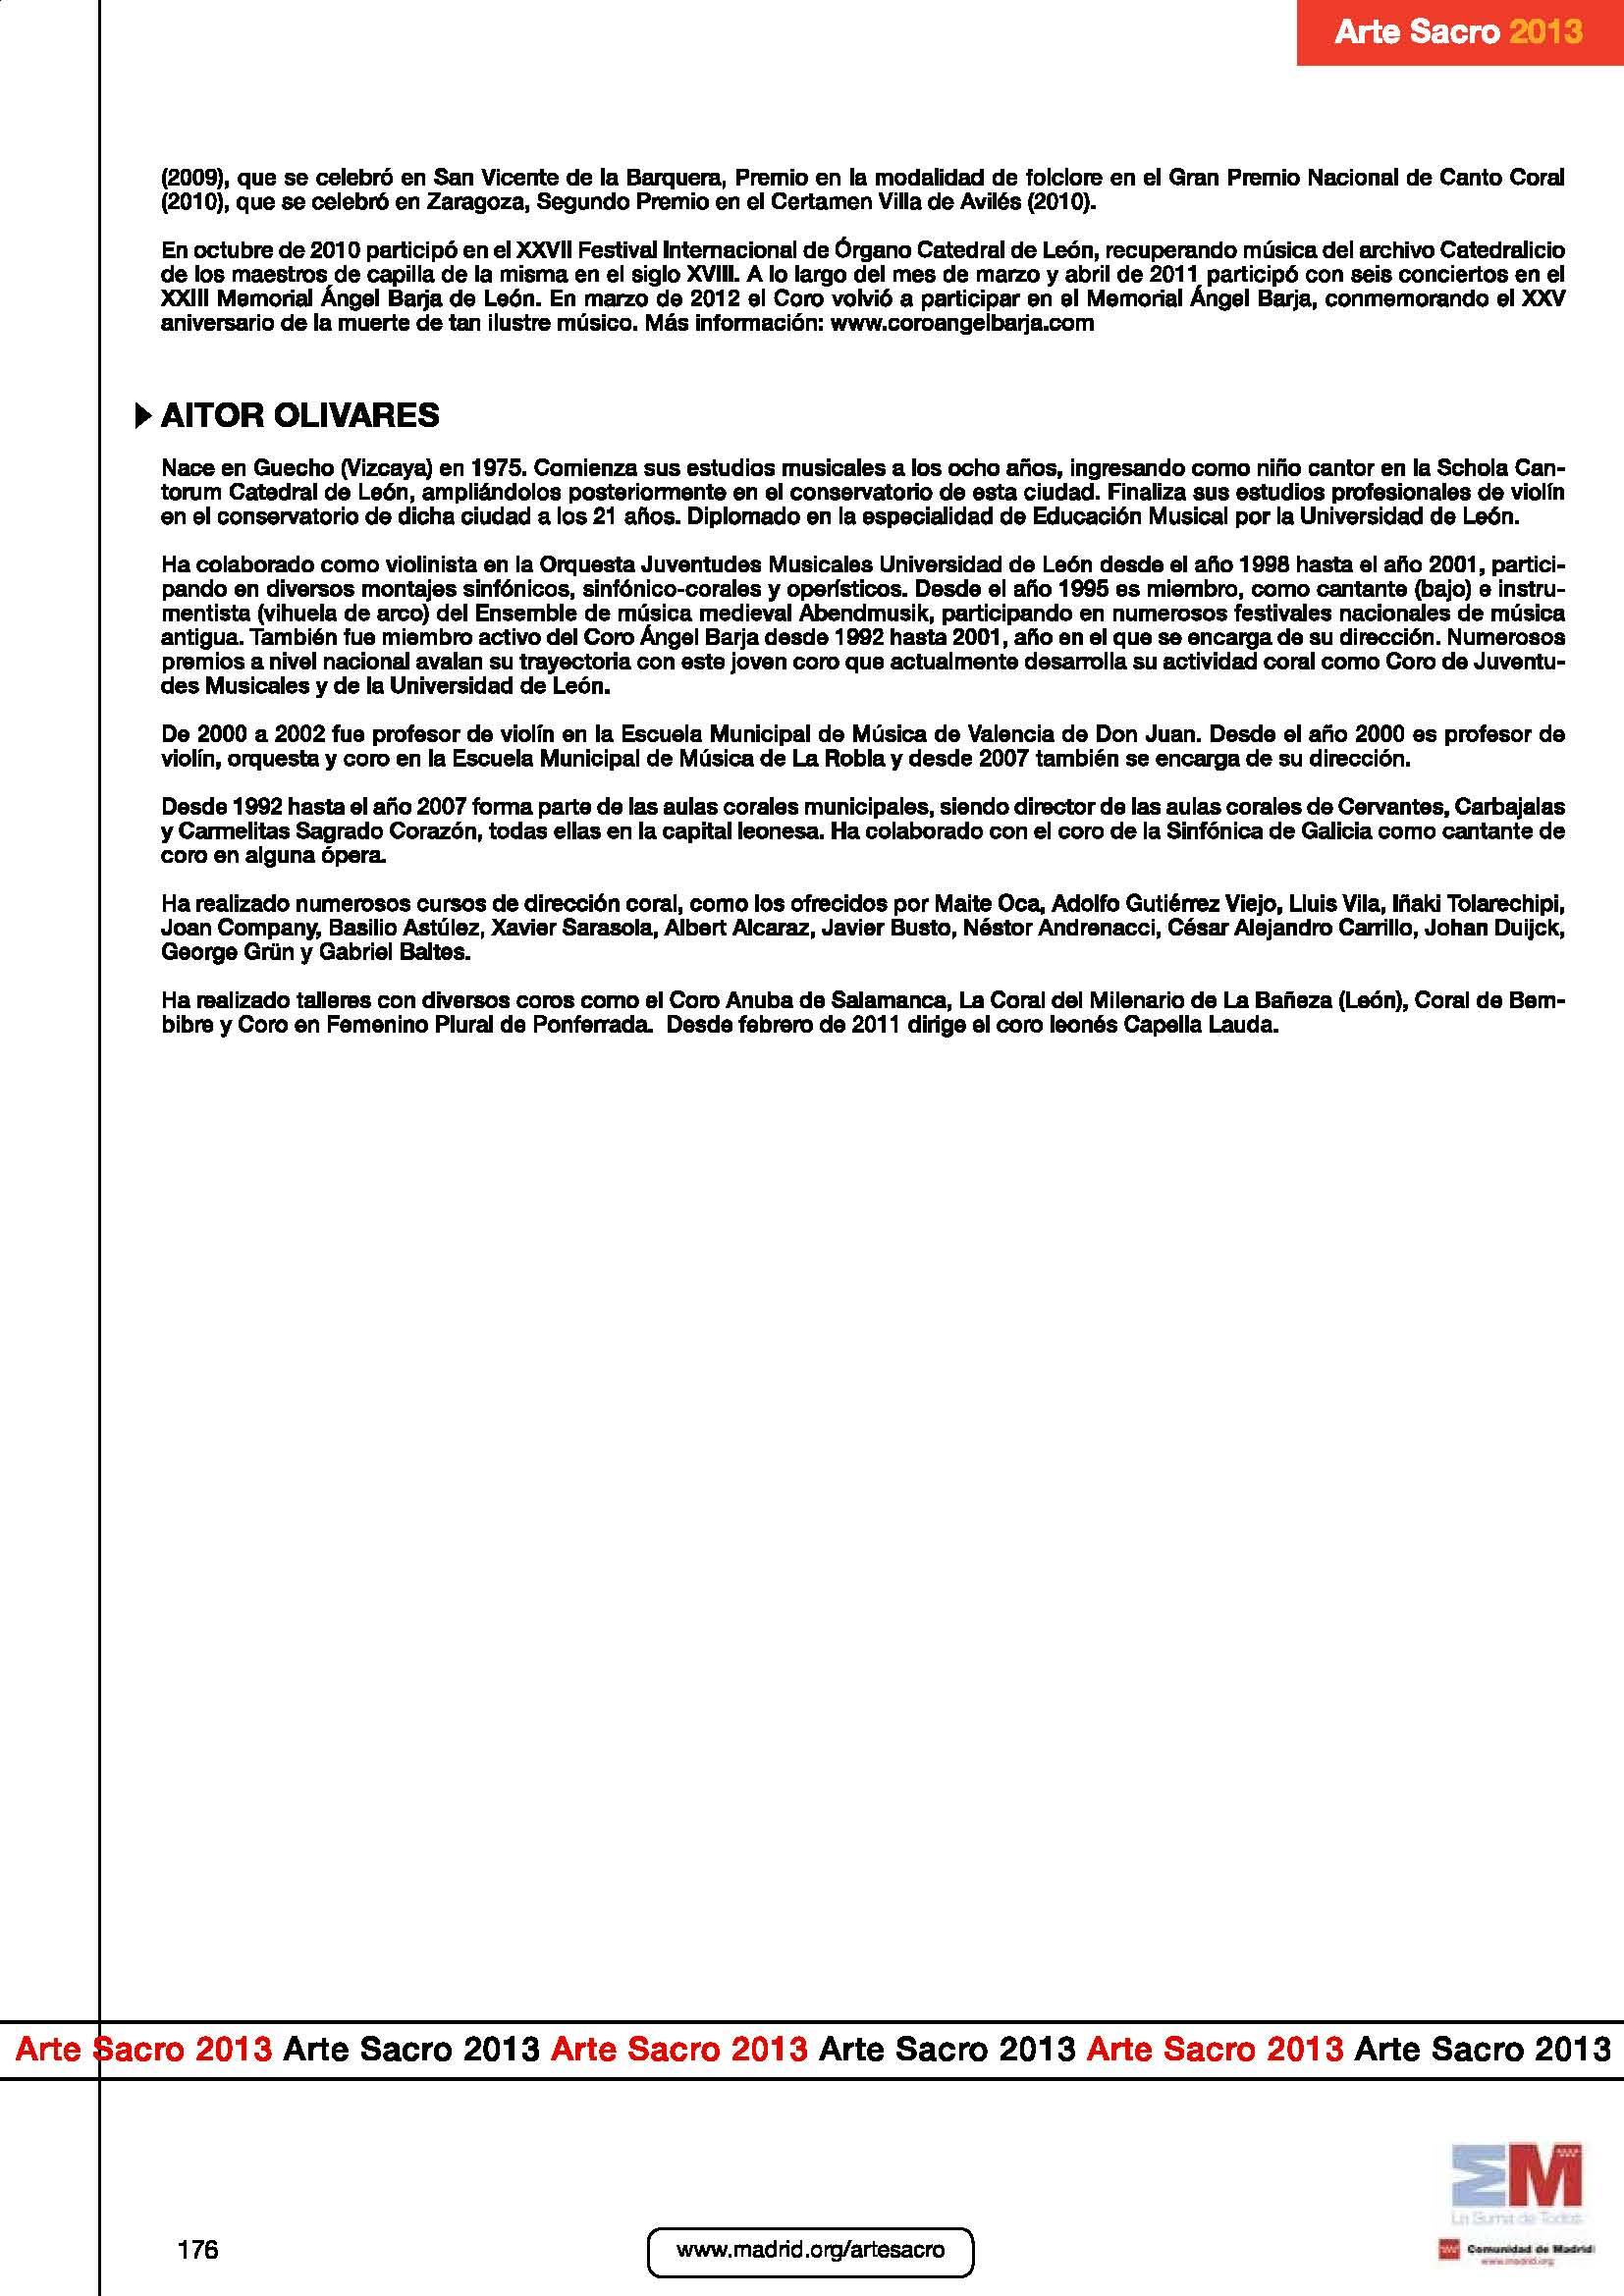 dossier_completo_Página_176